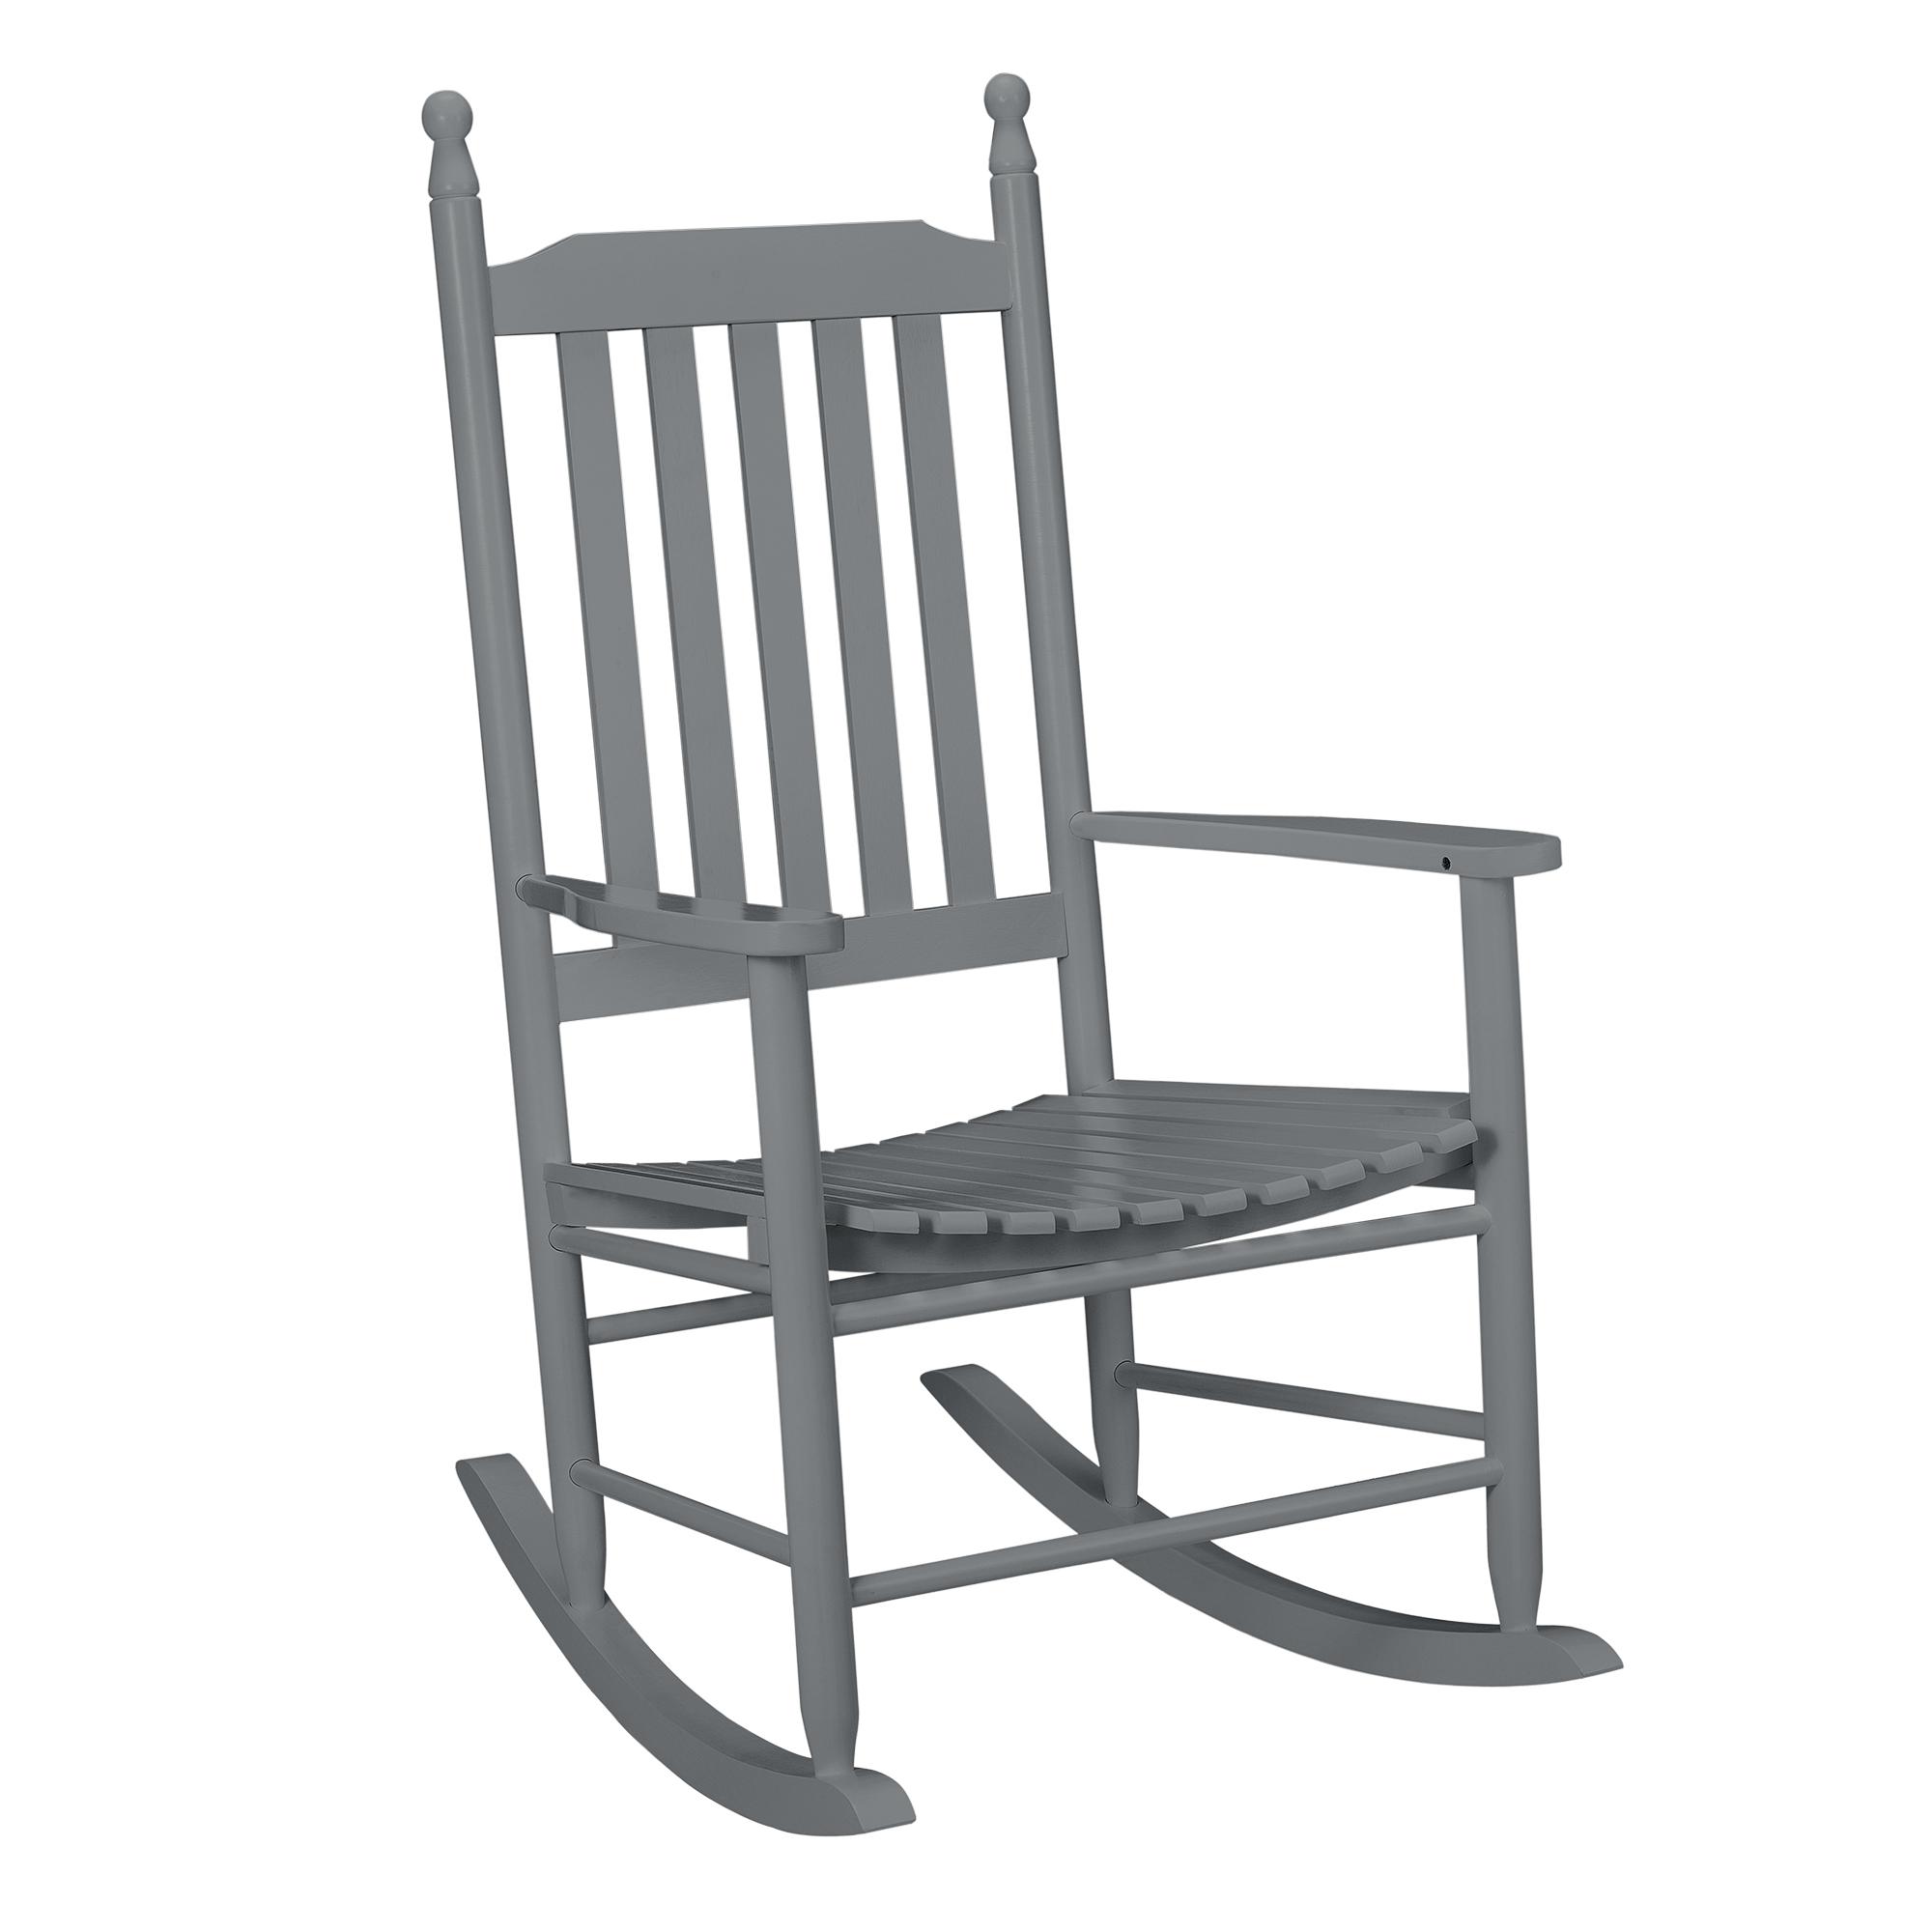 schaukelstuhl texas grau stuhl schwingsessel. Black Bedroom Furniture Sets. Home Design Ideas